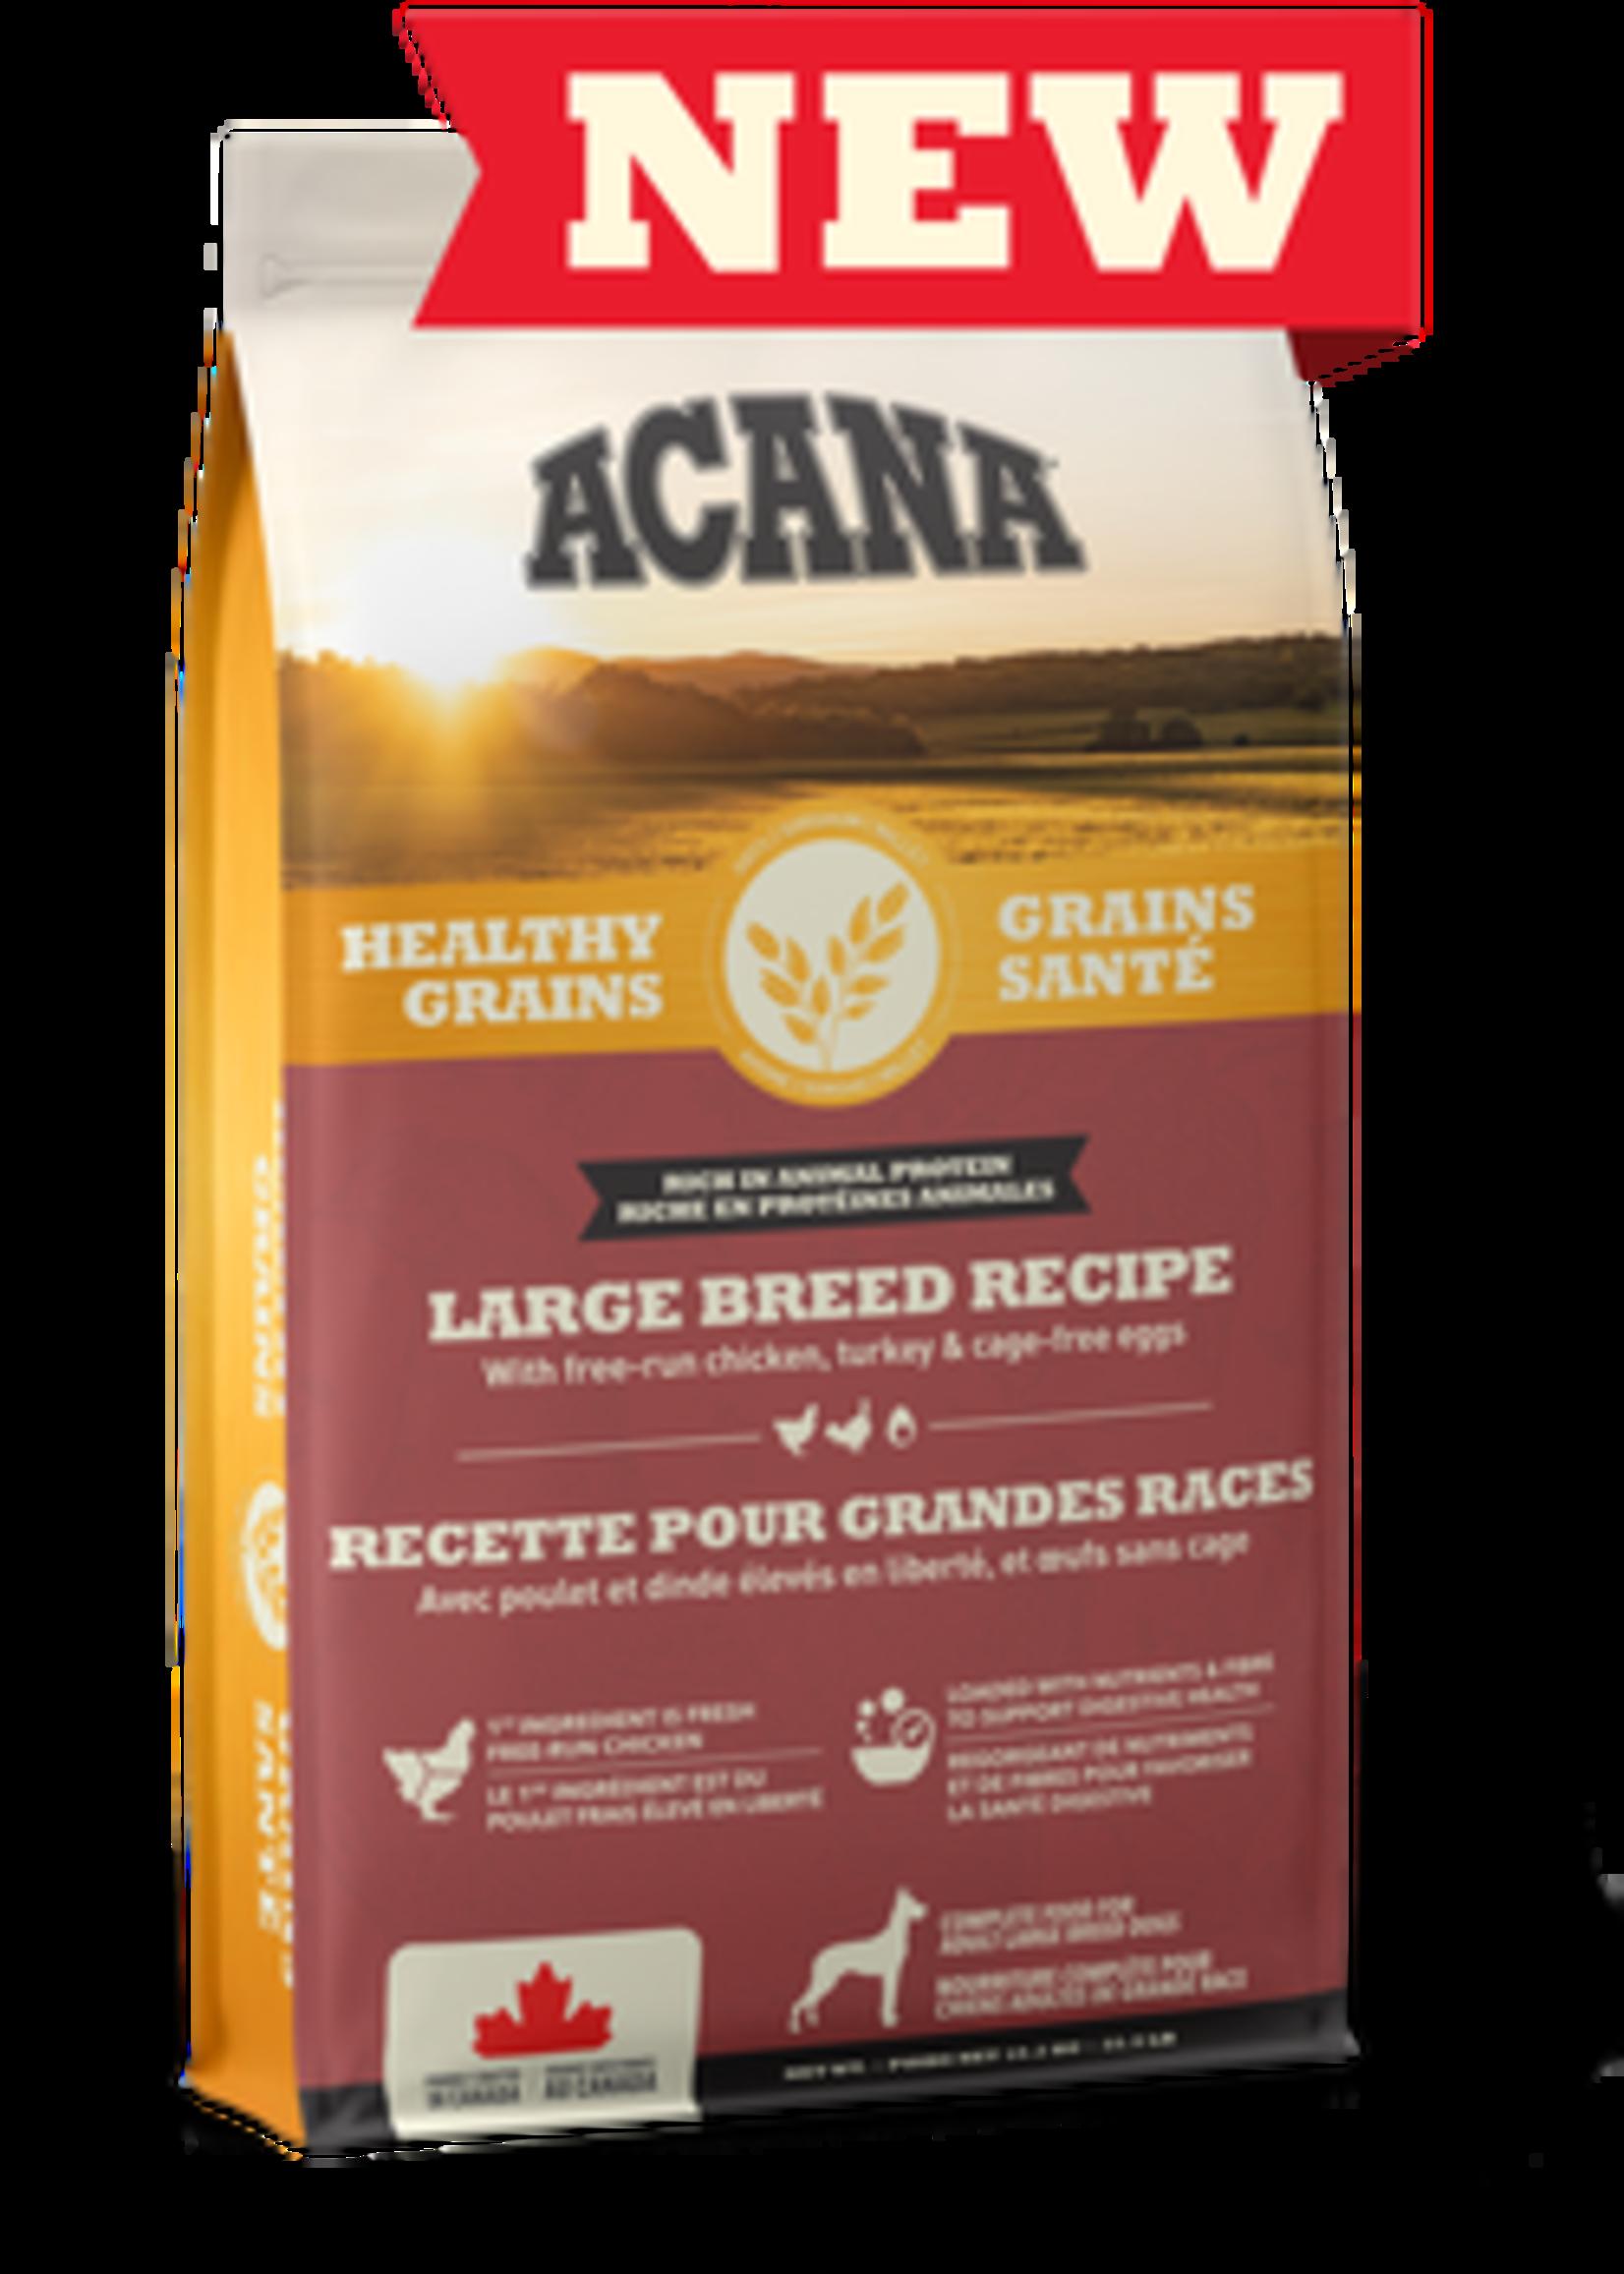 Acana® Acana Healthy Grains Large Breed Recipe 10.2kG